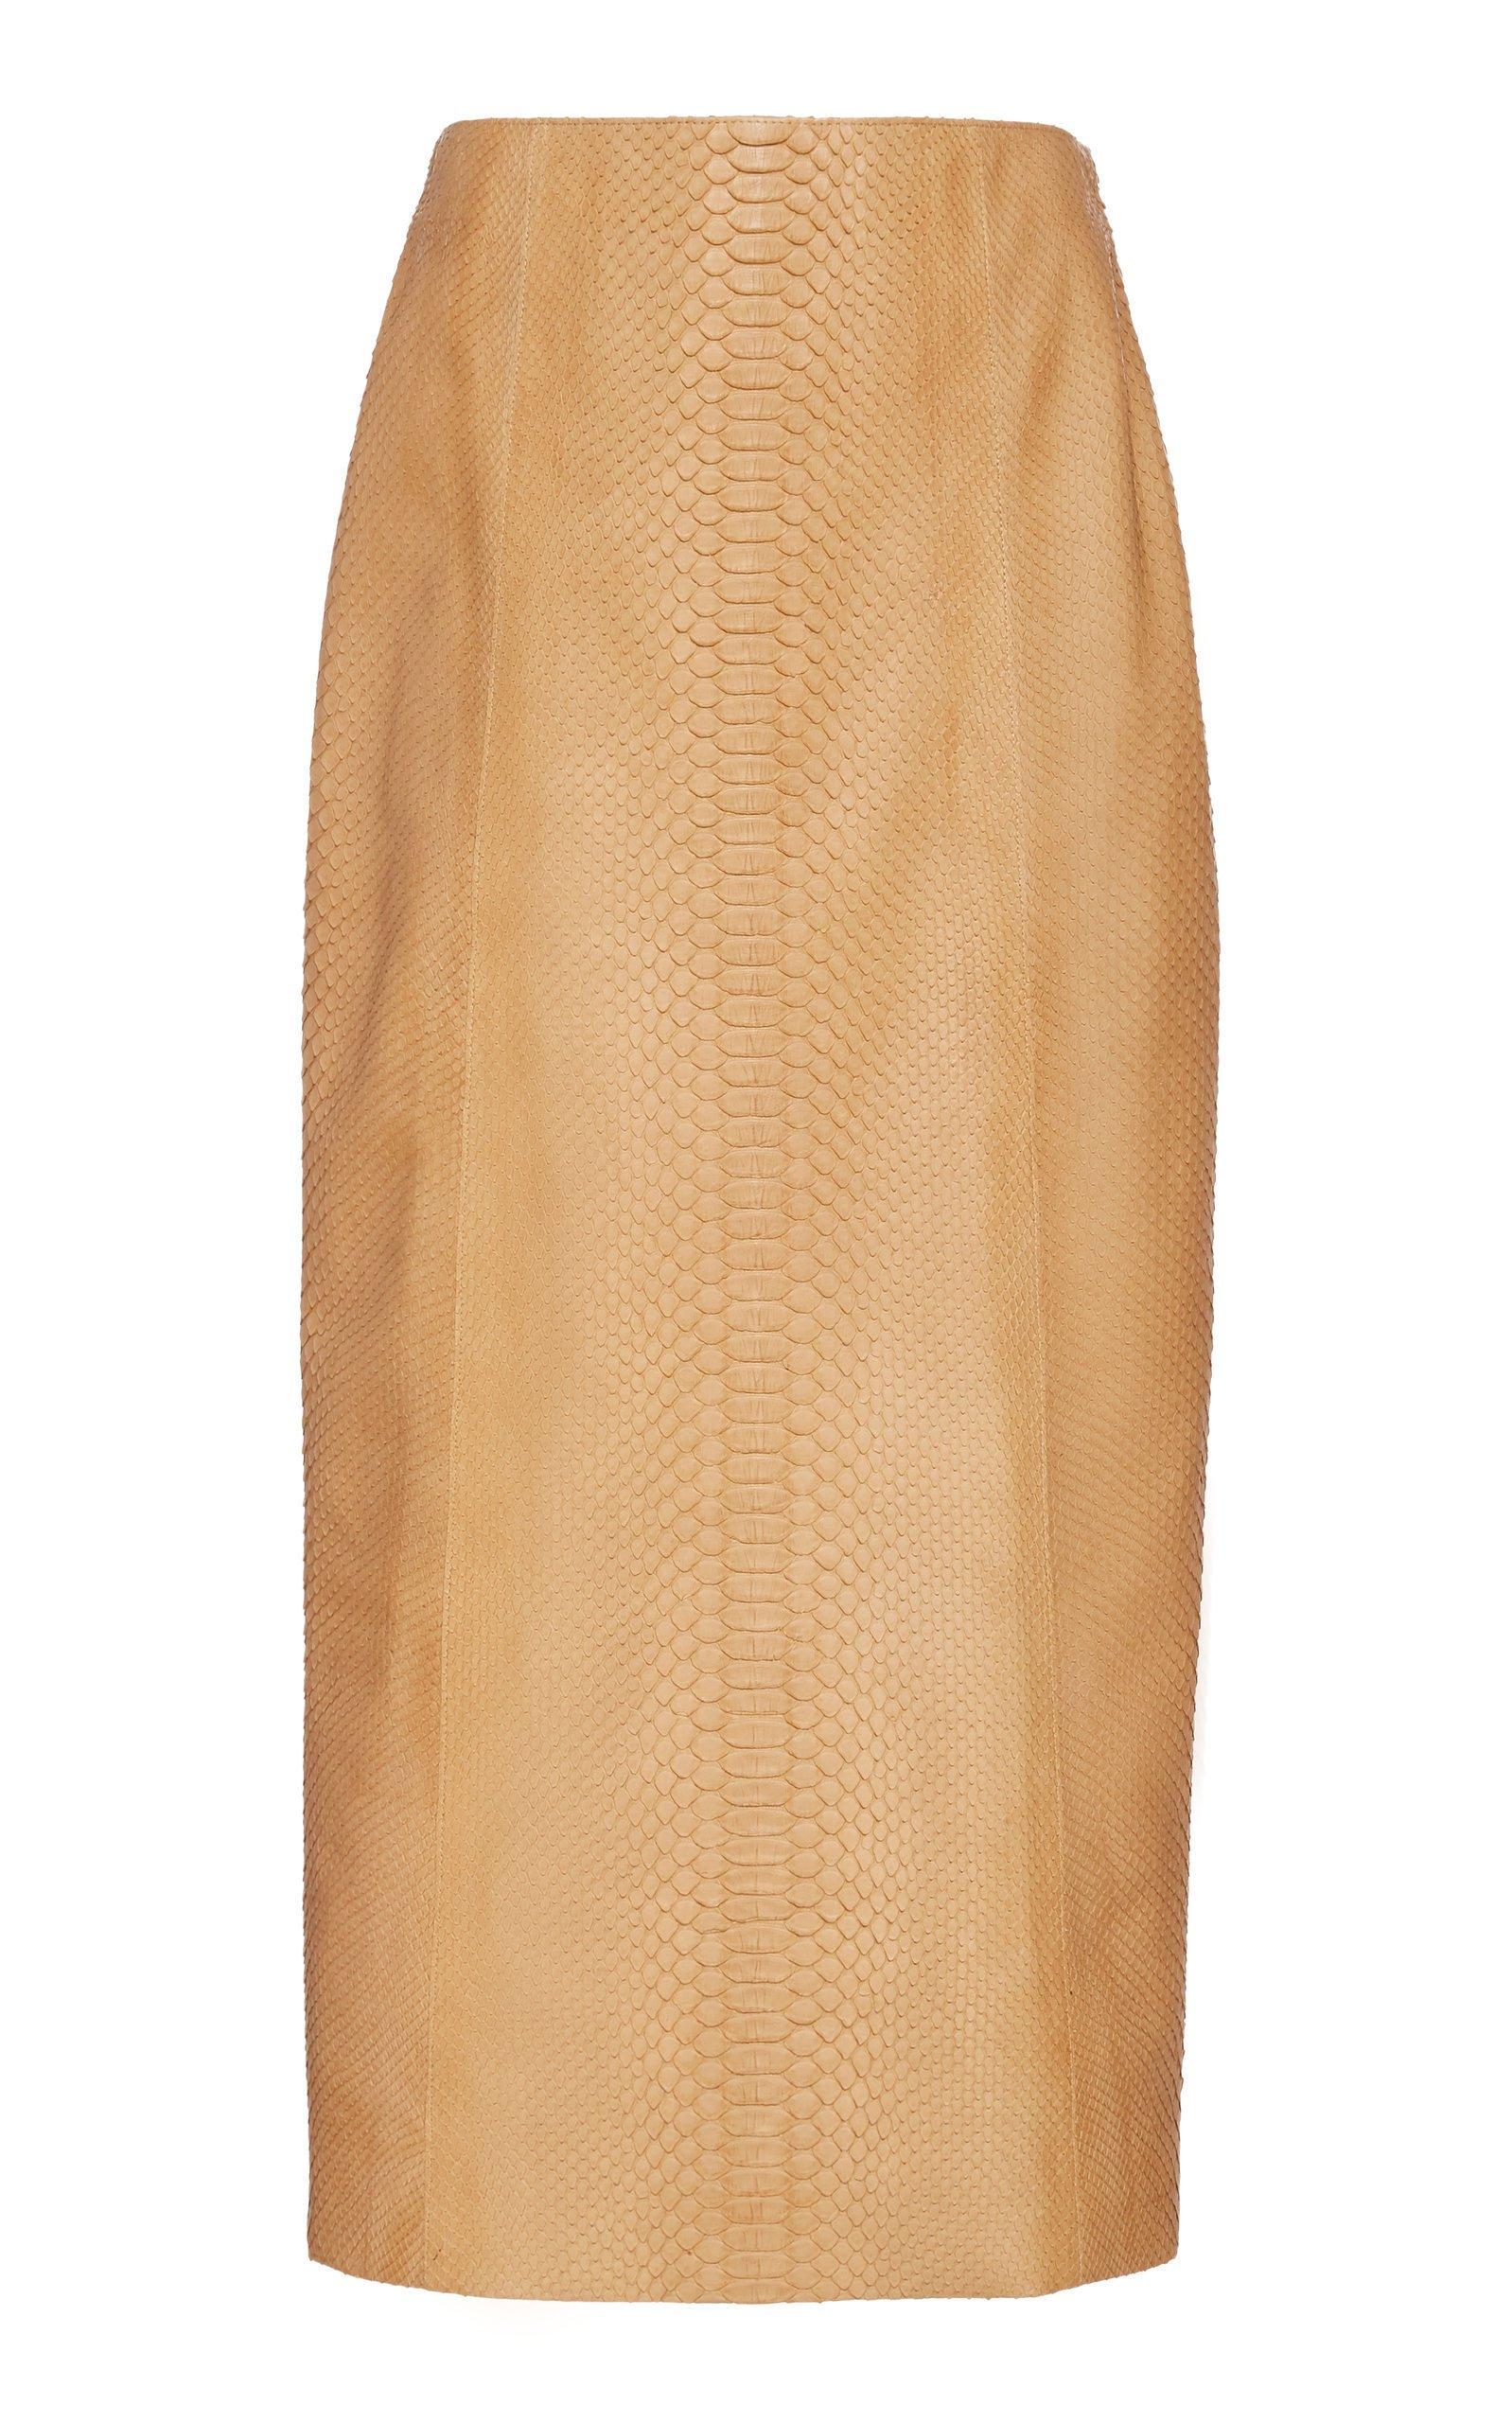 The Row Jenna Python Midi Skirt Size: 8